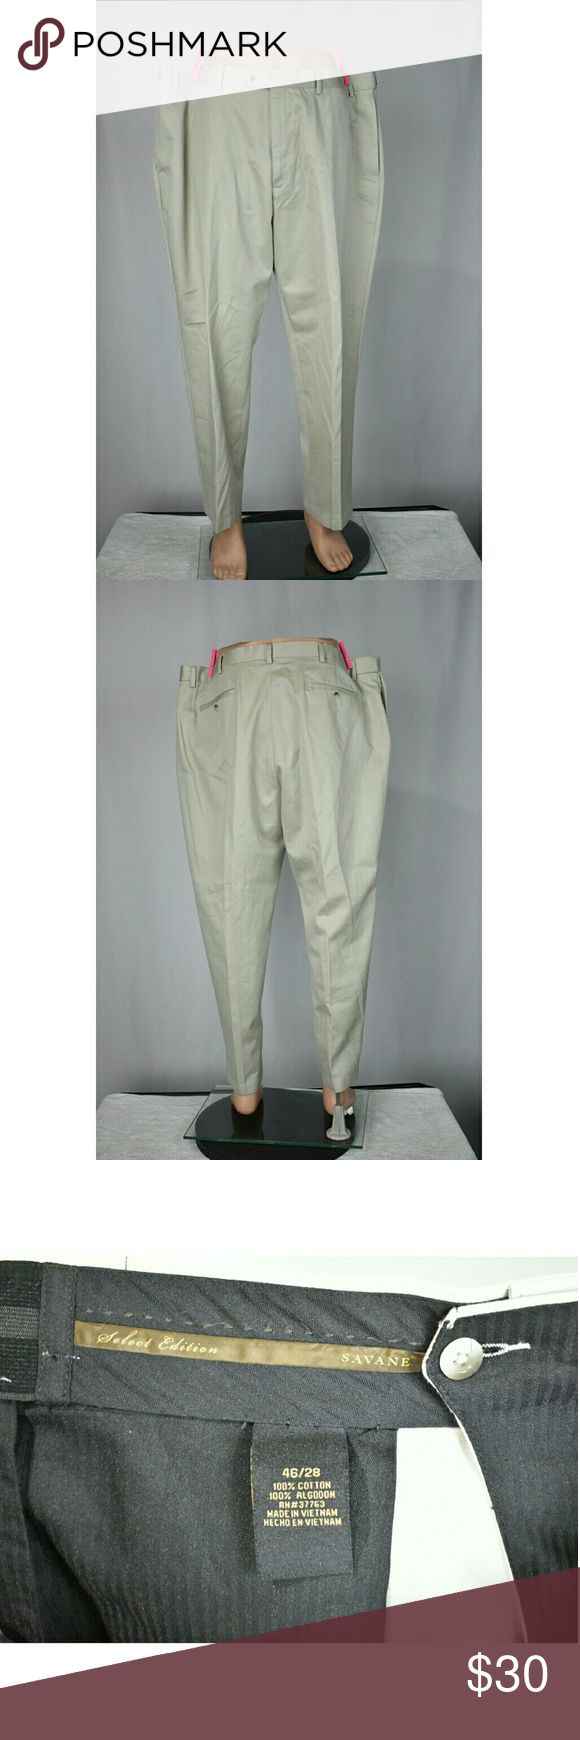 Big men's dress pants 46/28 Light Tan Brand                    : Savane Size                       : 46/28 Size type              : Regular Style                      : Dress Pants Color                     : Light Tan Inventory              : B57 Savane Pants Chinos & Khakis